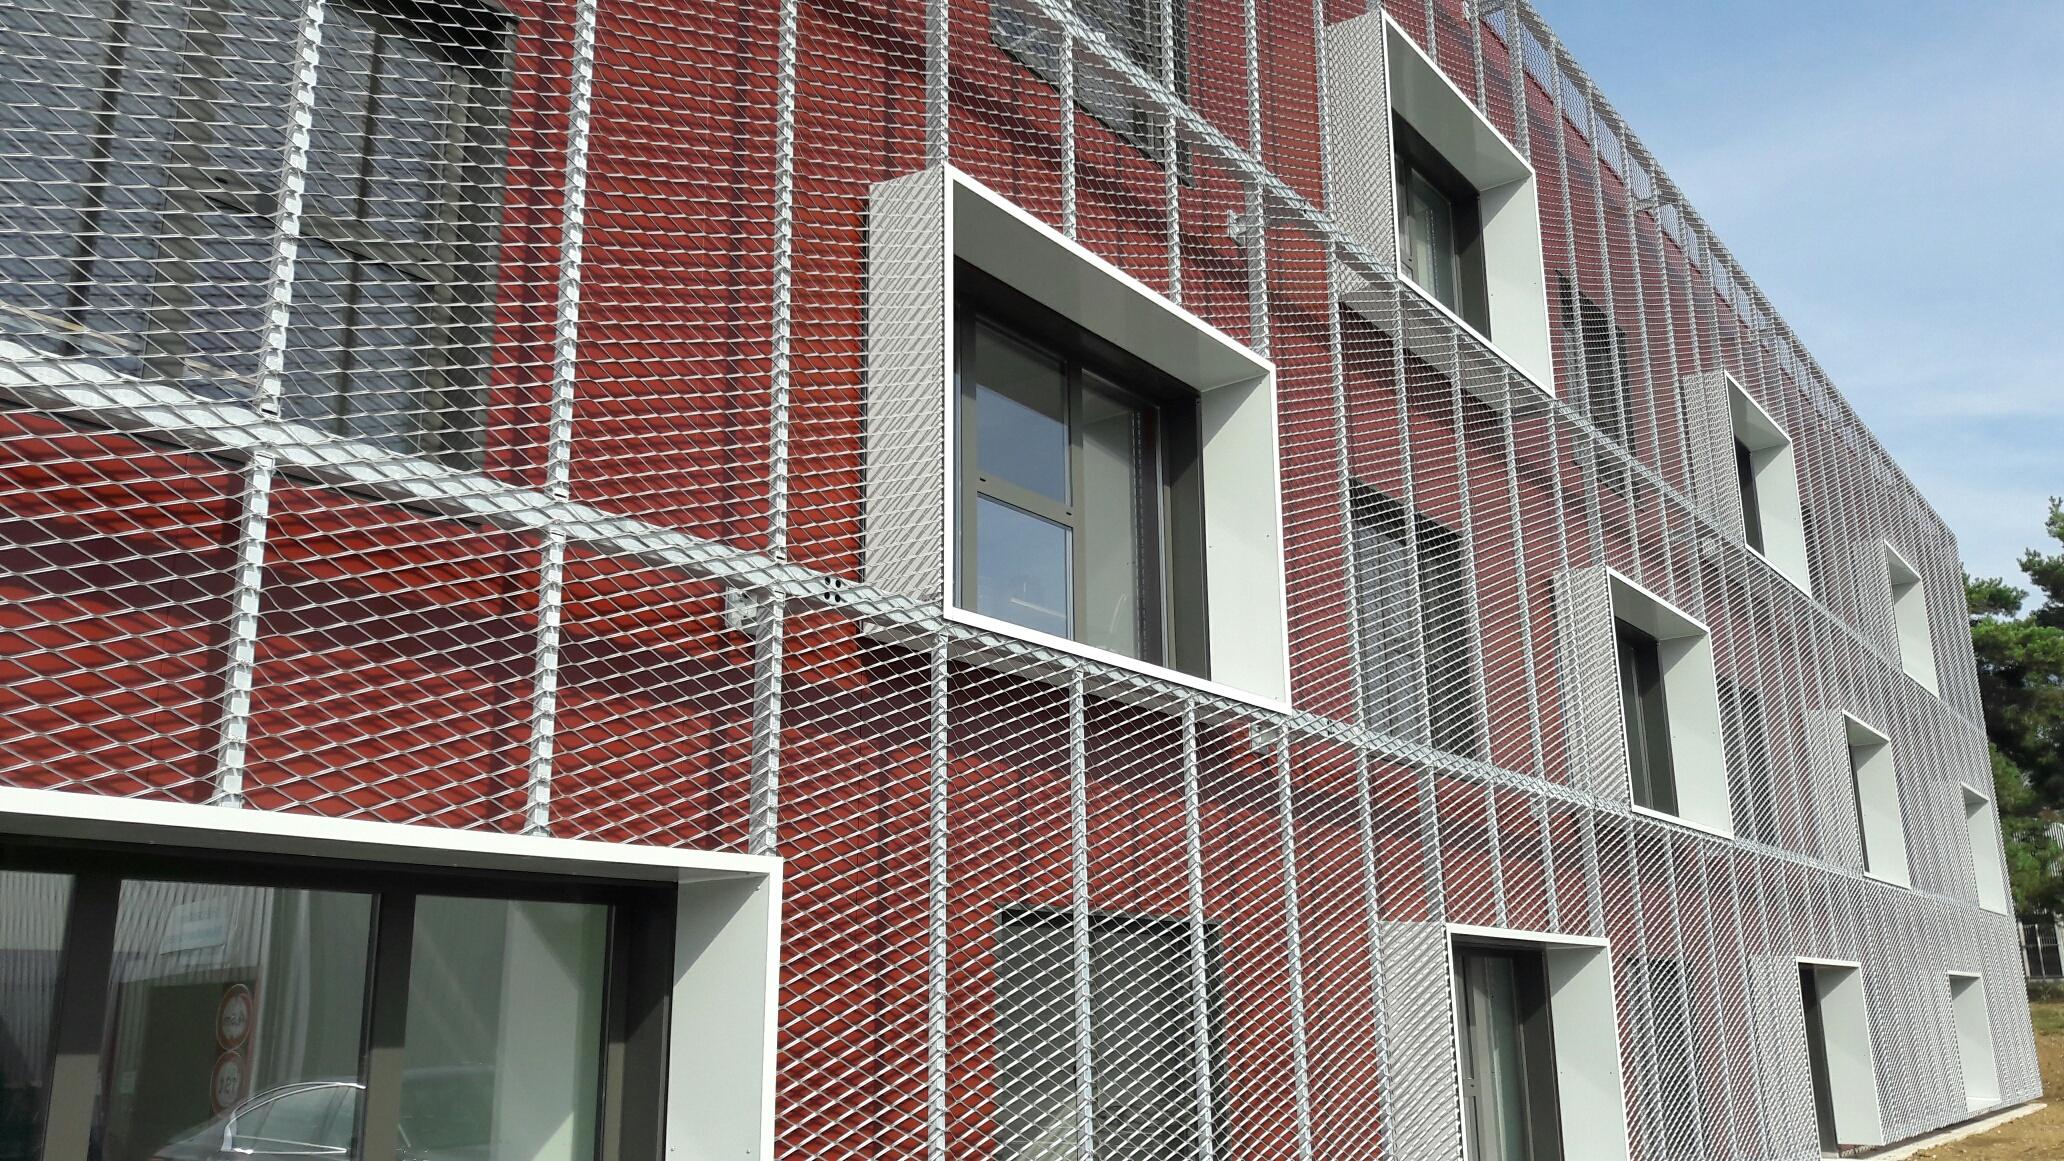 etancheite facade exterieur isolation extrieure faade bardage toiture with etancheite facade. Black Bedroom Furniture Sets. Home Design Ideas